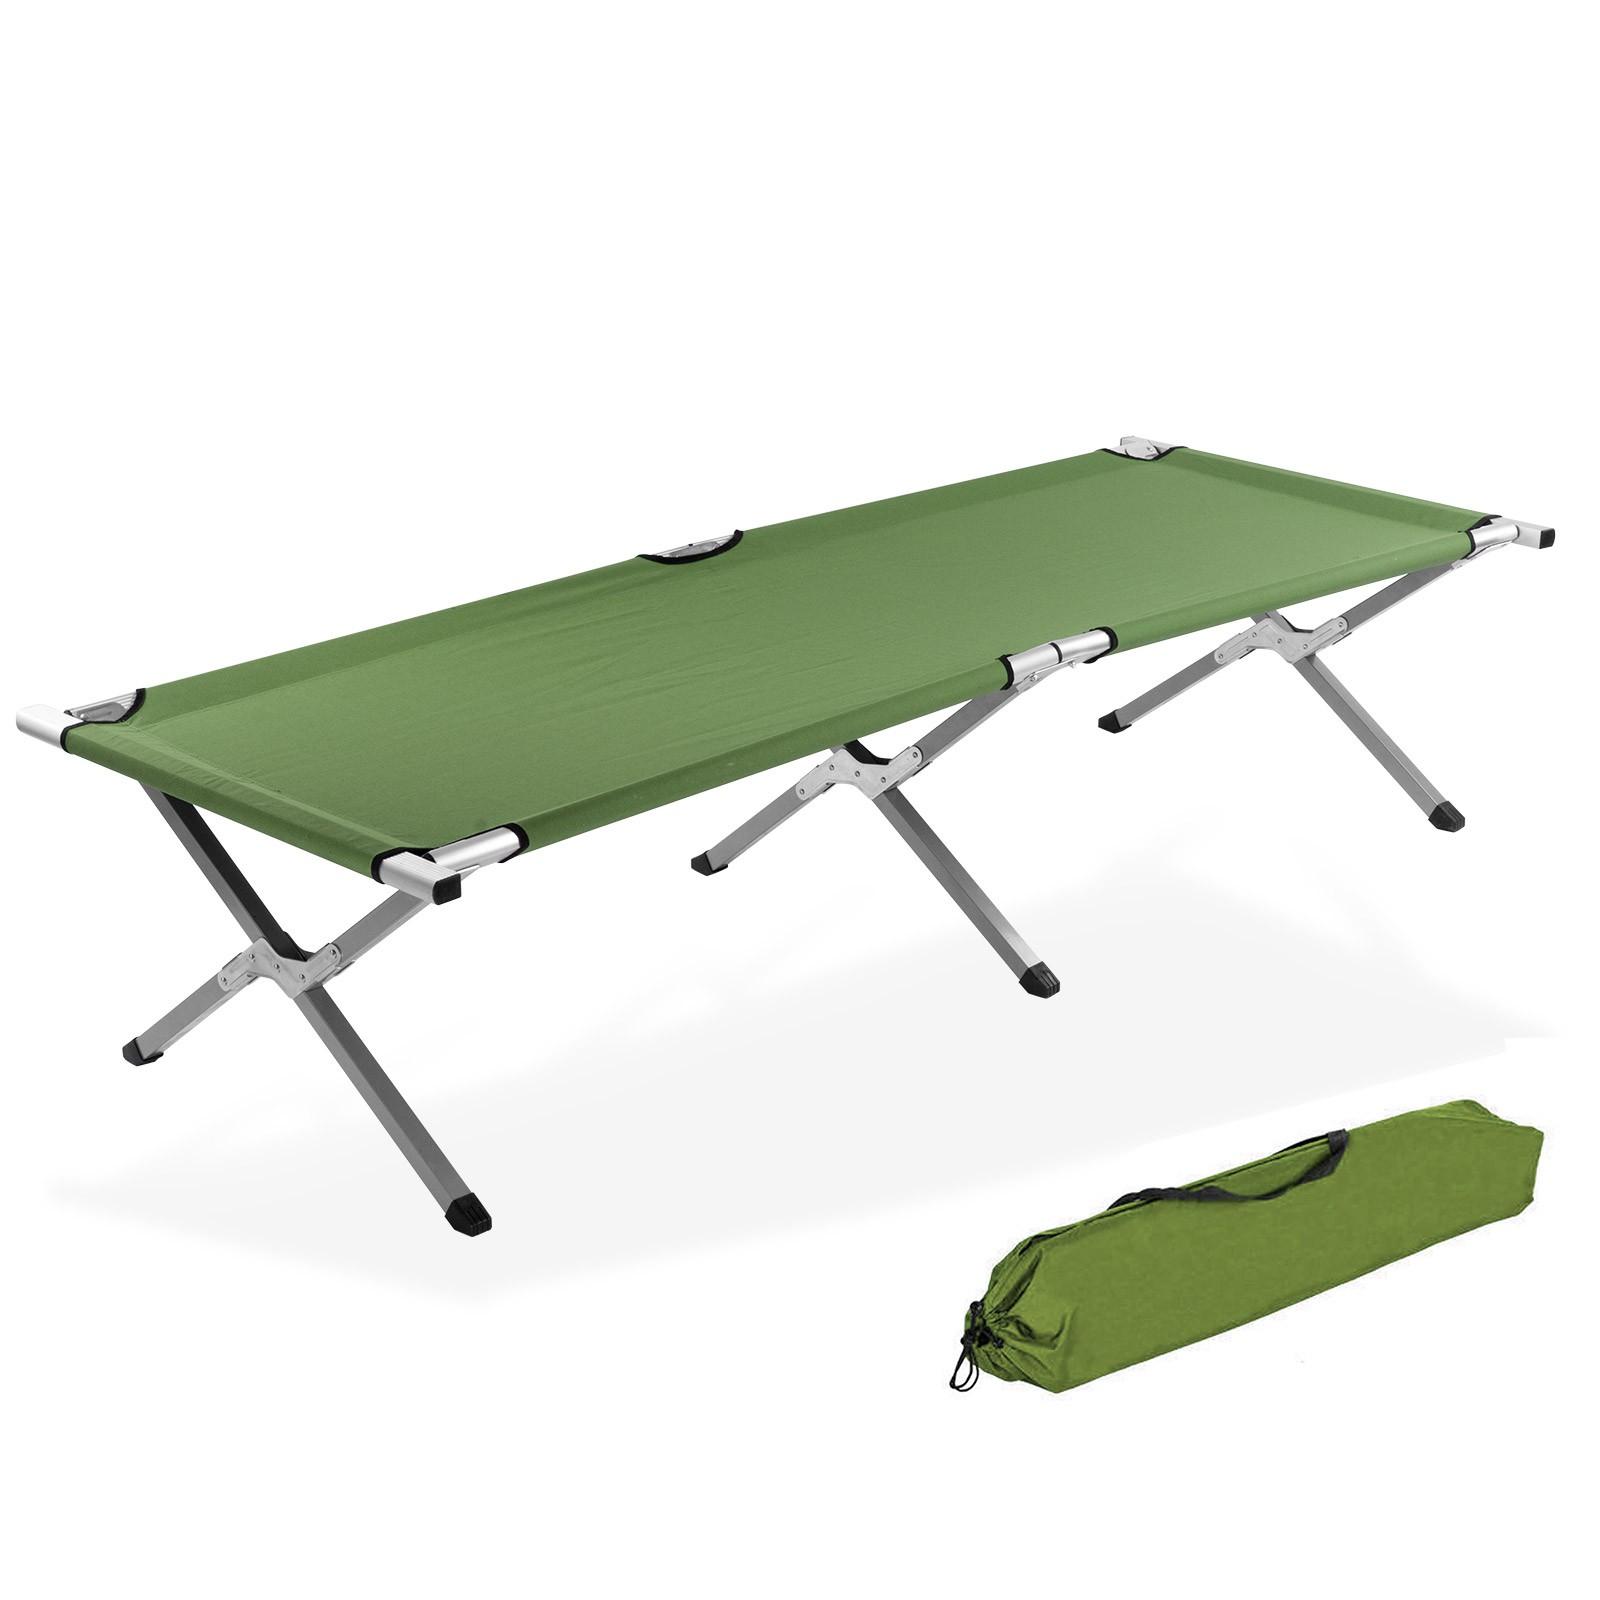 feldbett campingliege reisebett ranger farbe nach wahl. Black Bedroom Furniture Sets. Home Design Ideas